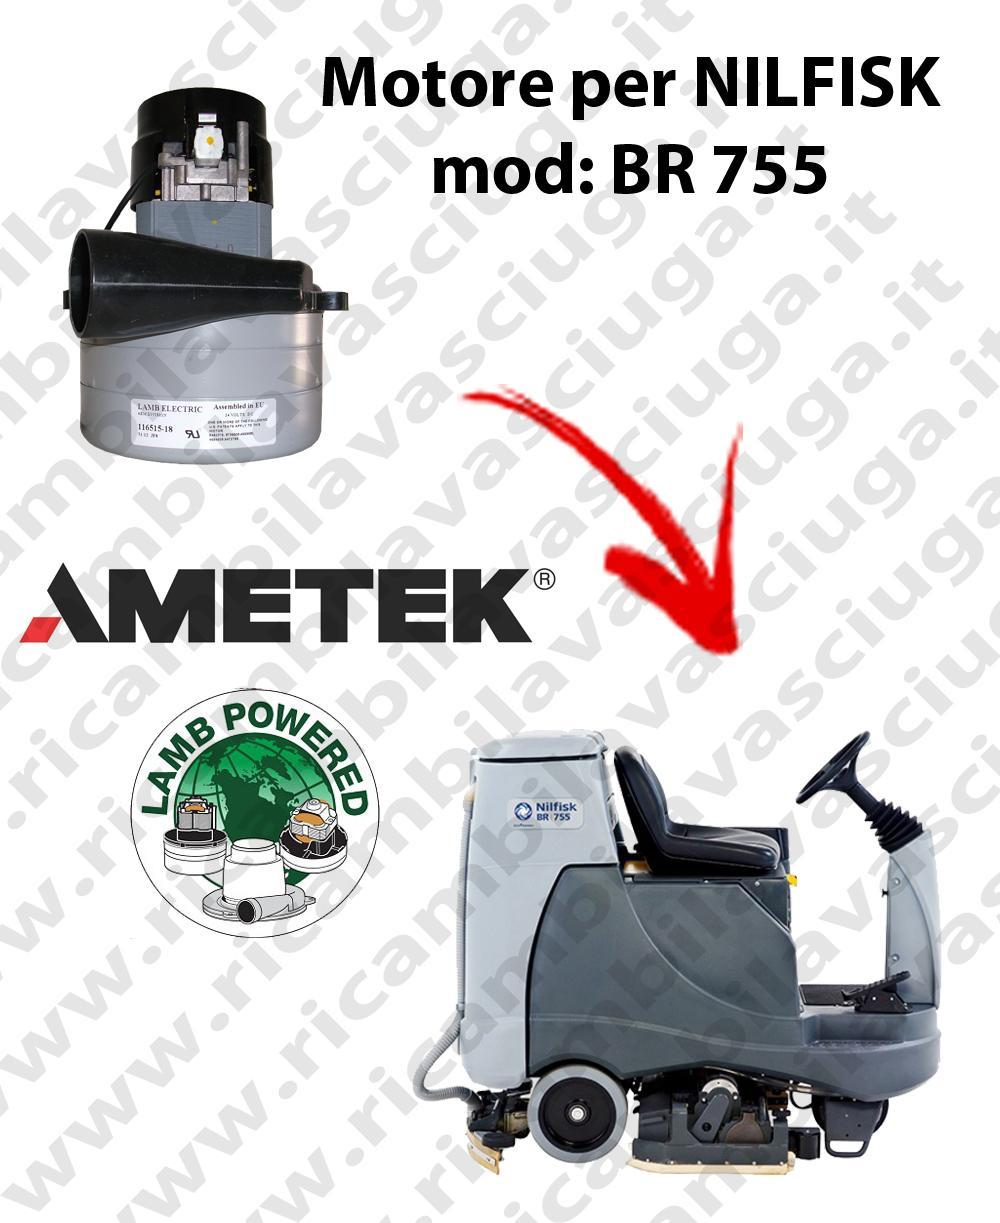 BR 755 Motore de aspiración LAMB AMETEK para fregadora NILFISK